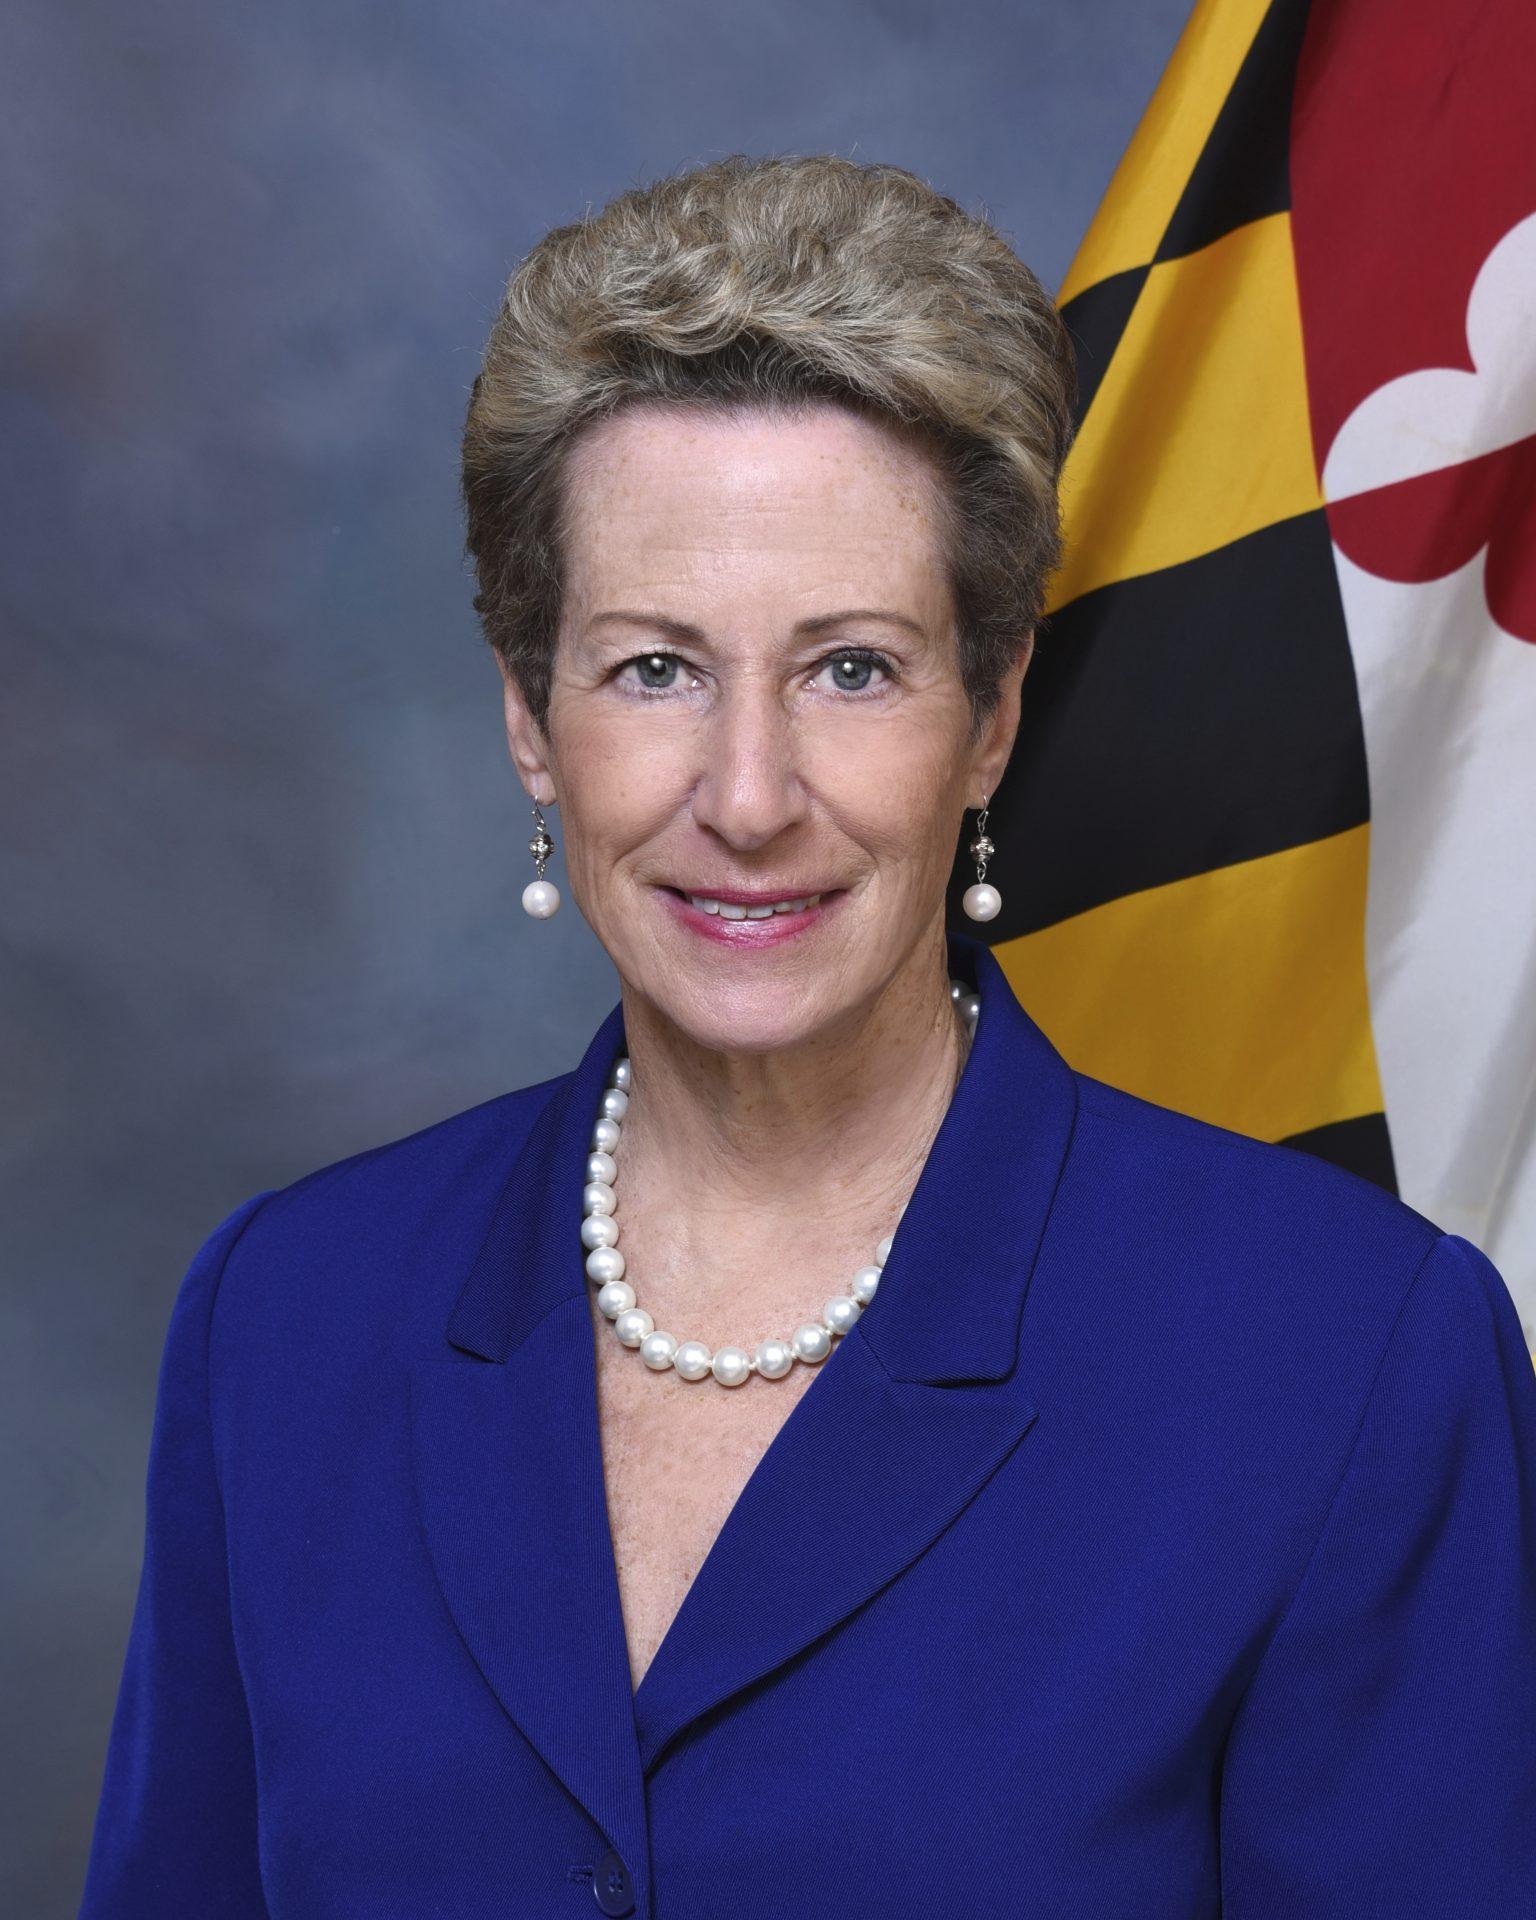 Maryland Interagency Commission on School Construction – December 10, 2020 Agenda